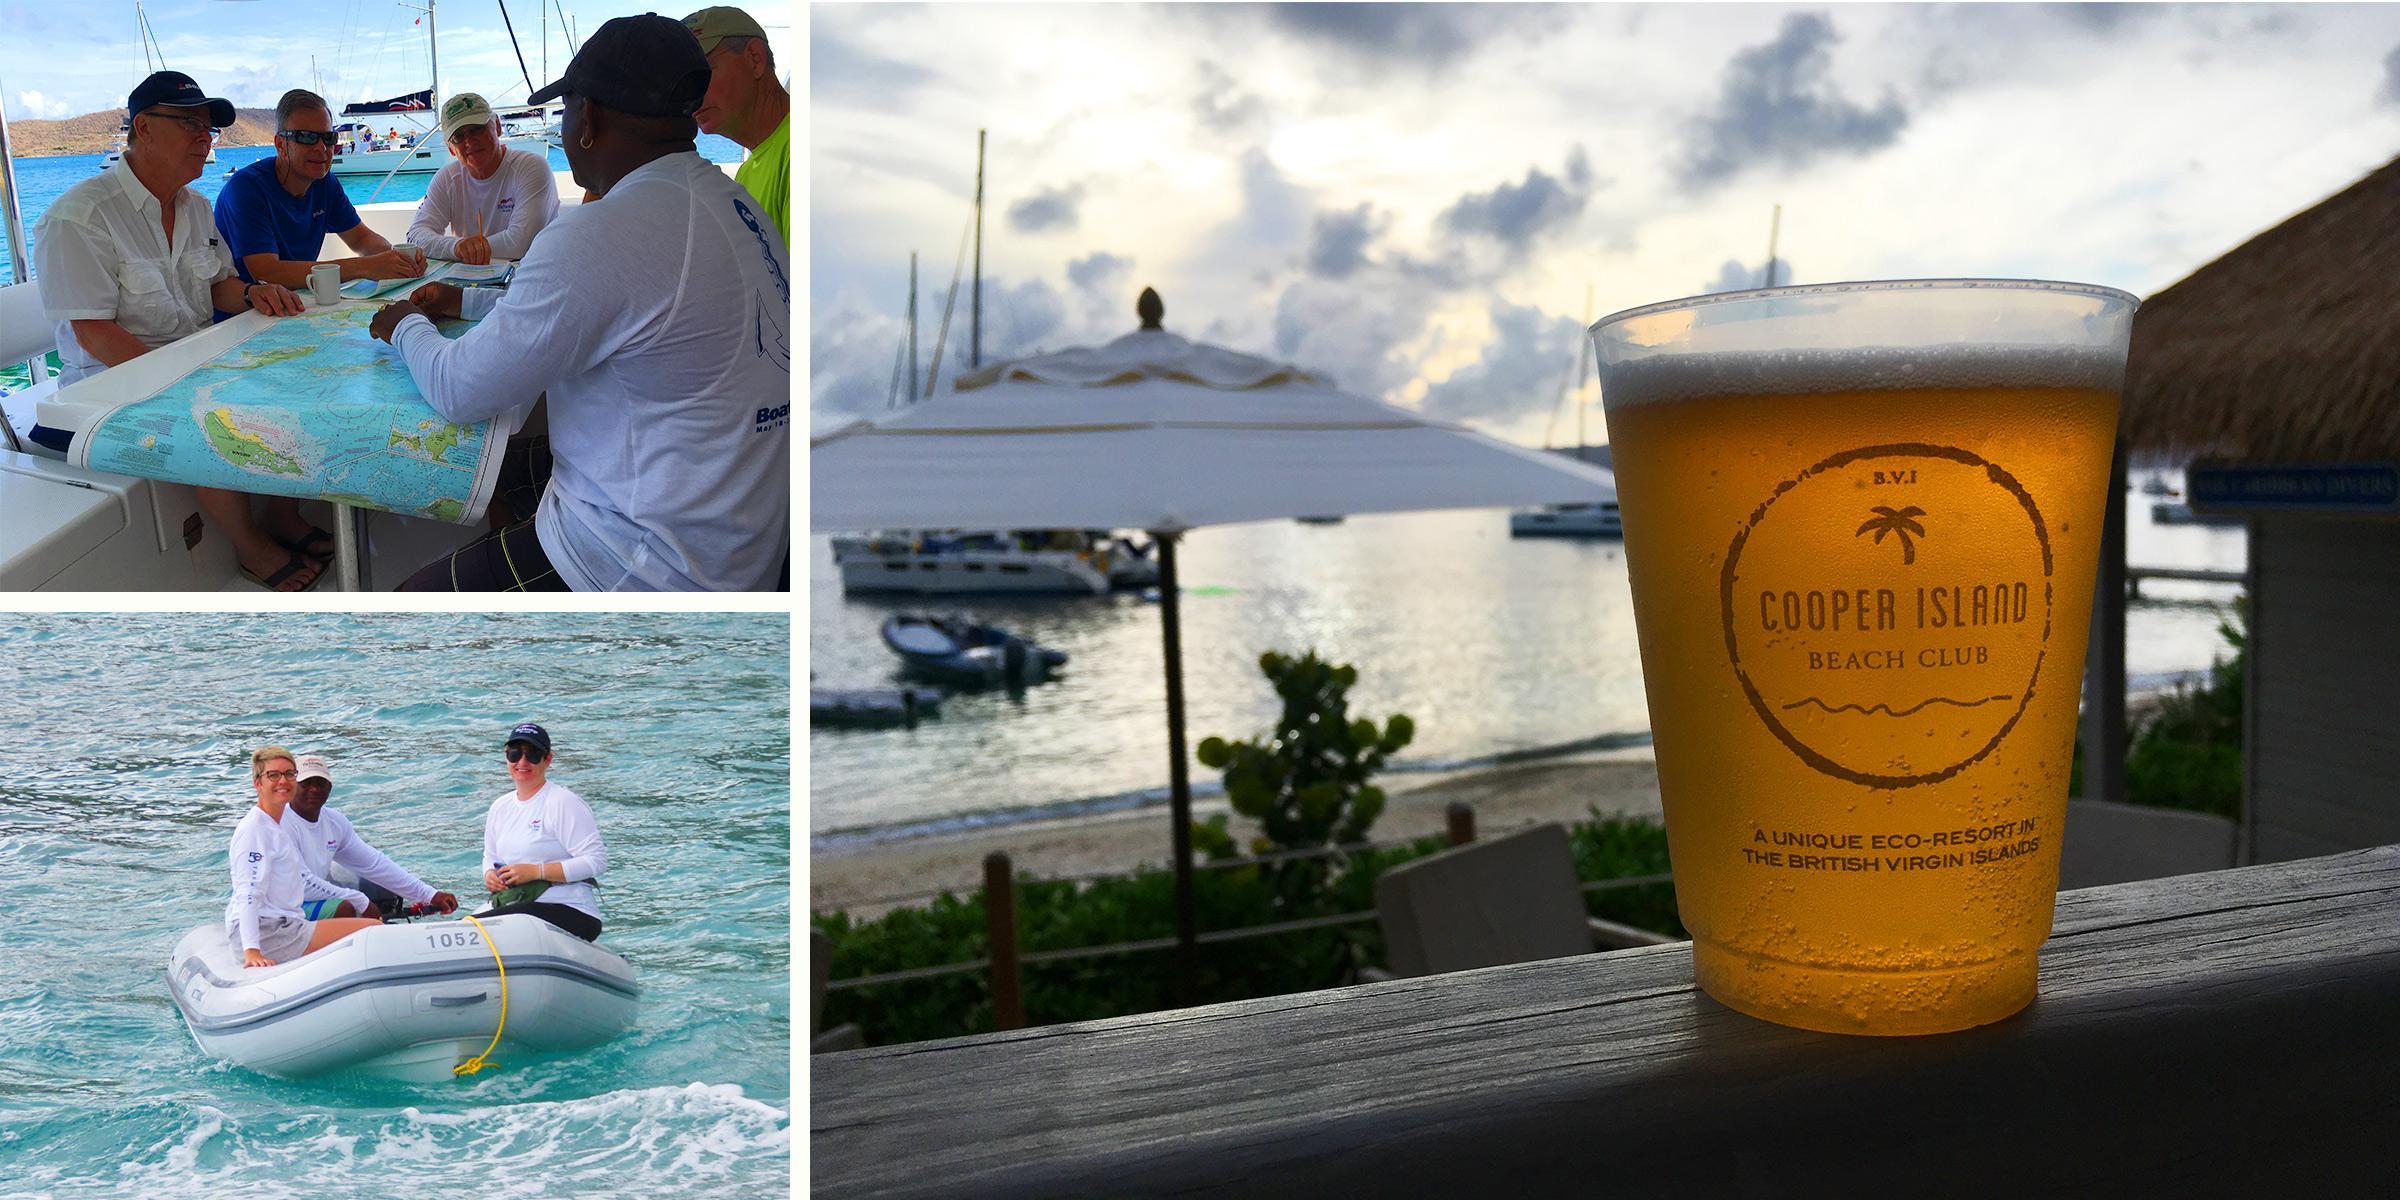 BoatU.S. Flotilla 2019 Crew at Cooper Island Beach Club